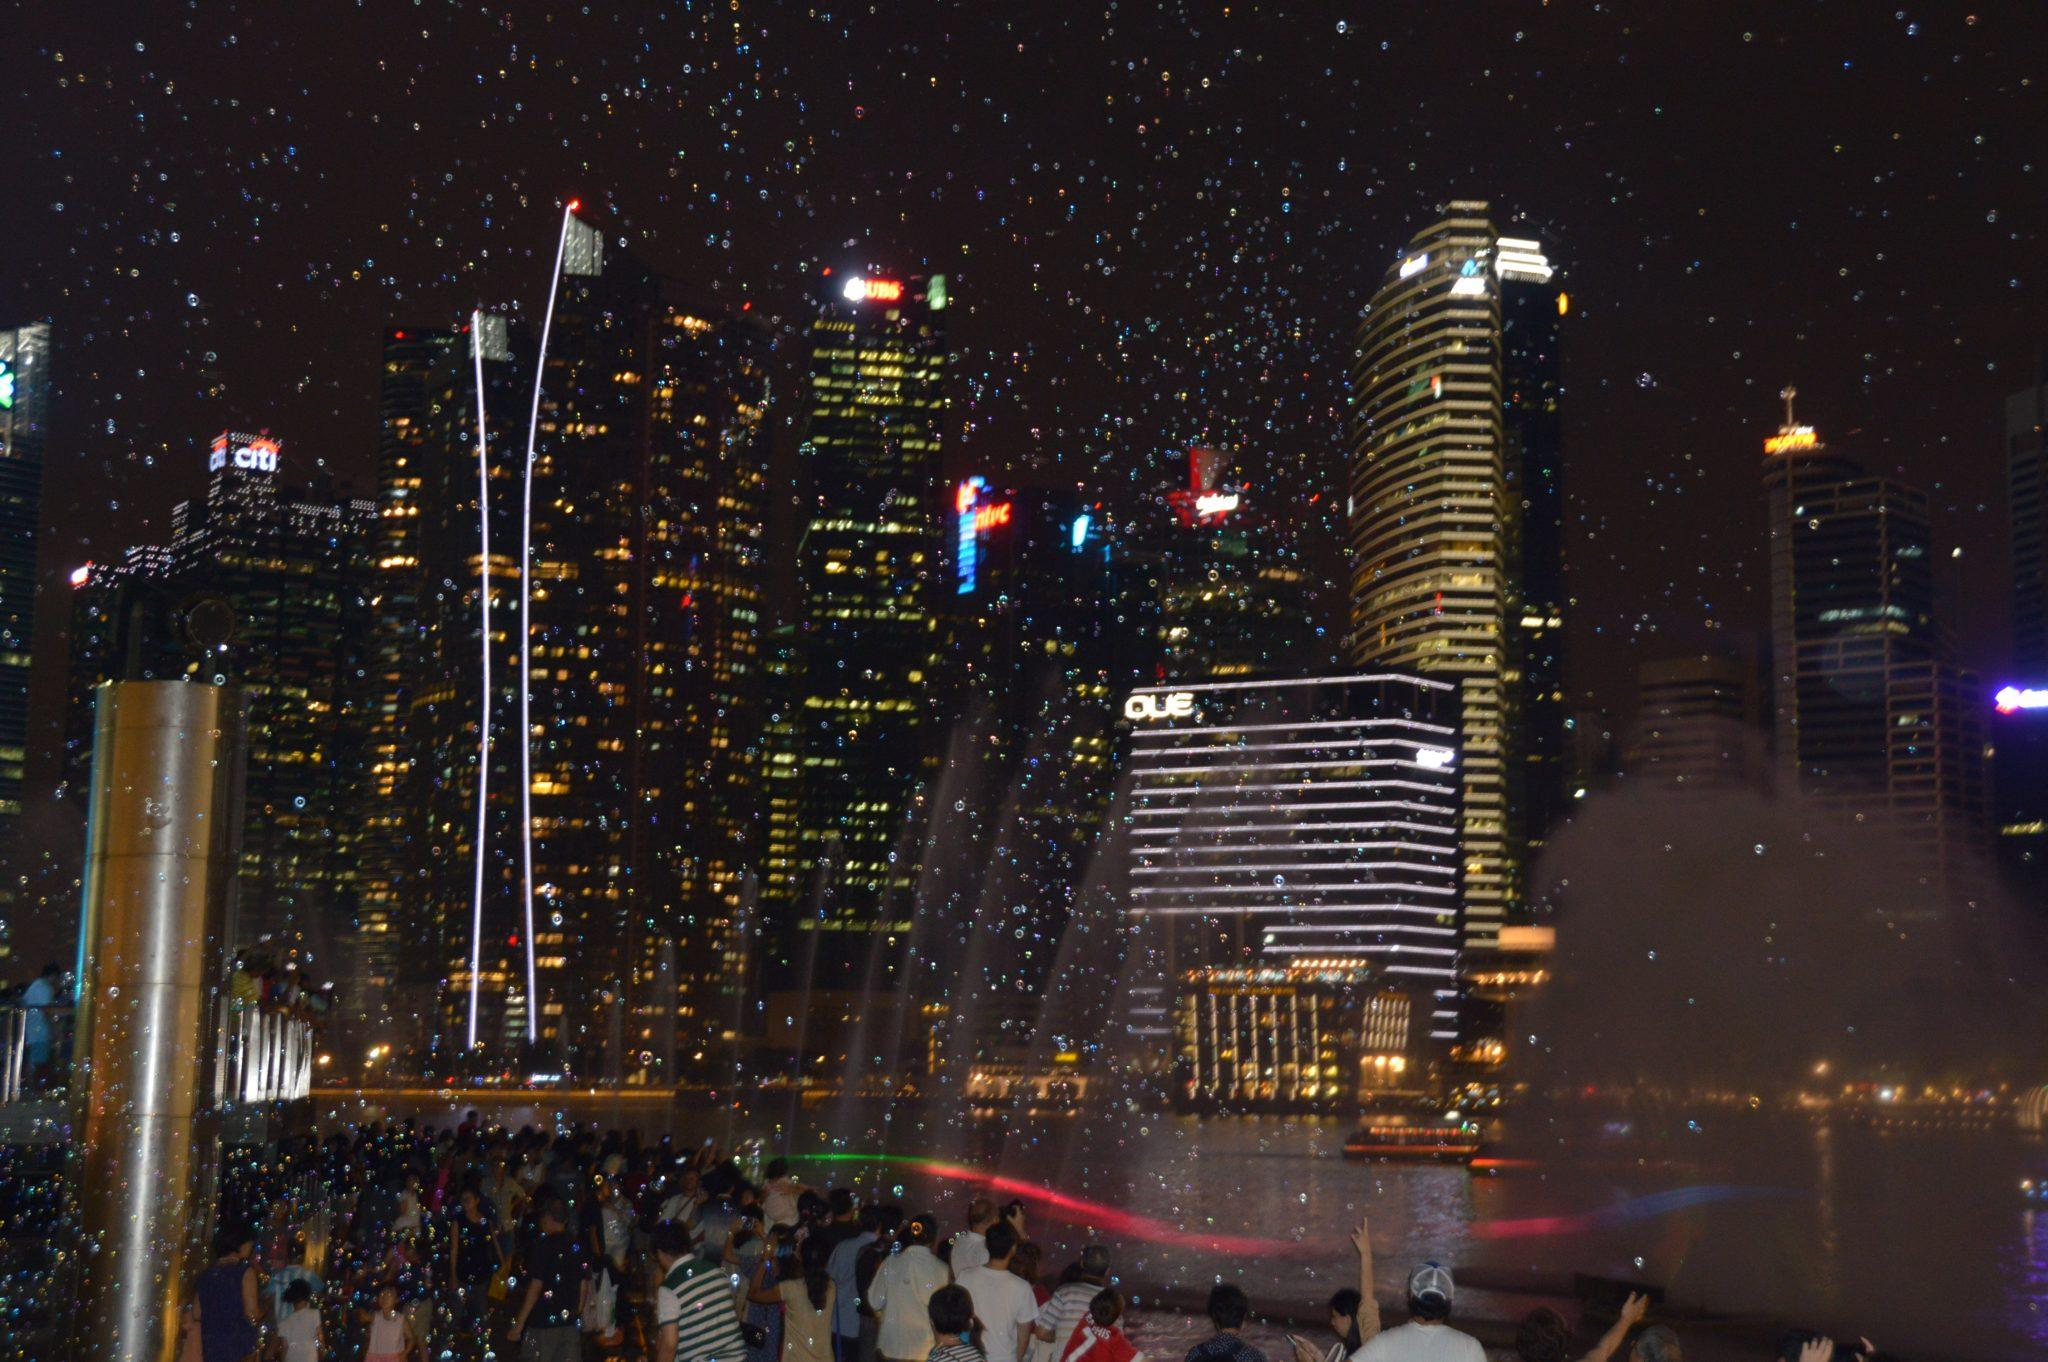 The night show at Marina Bay Sands